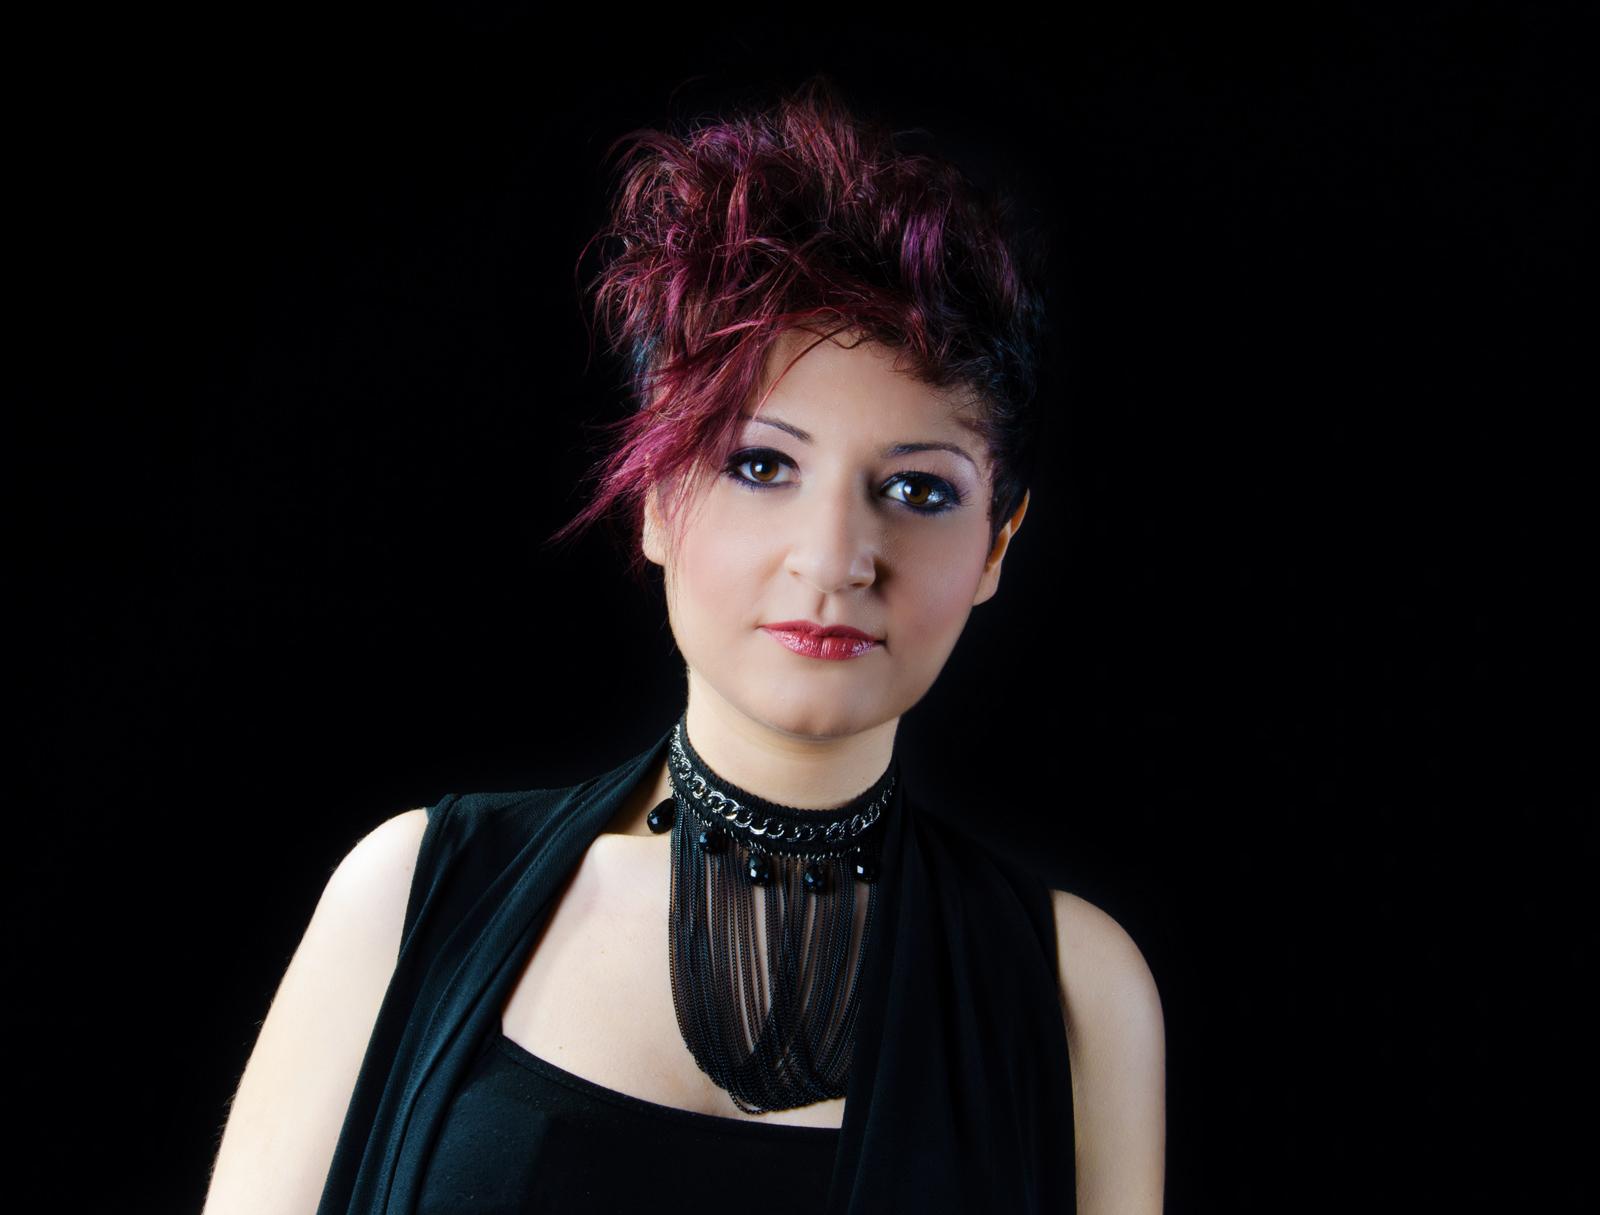 immagine_donna_parrucchieri_torregrotta_messina_estetista_parrucchiere_uomo-donna_cosmetici_salone_Jessica11